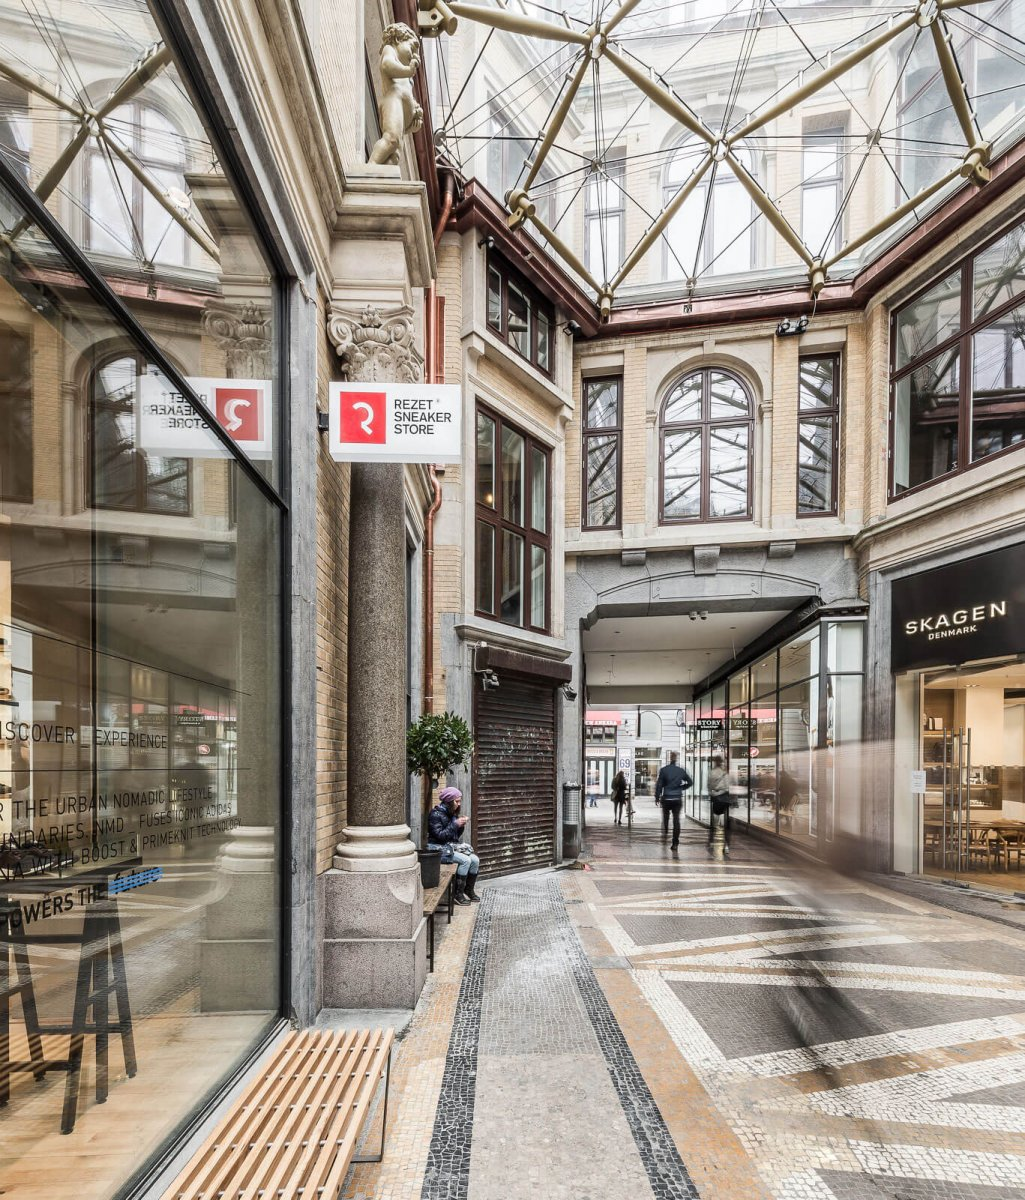 Rezet Store Jorcks Passage